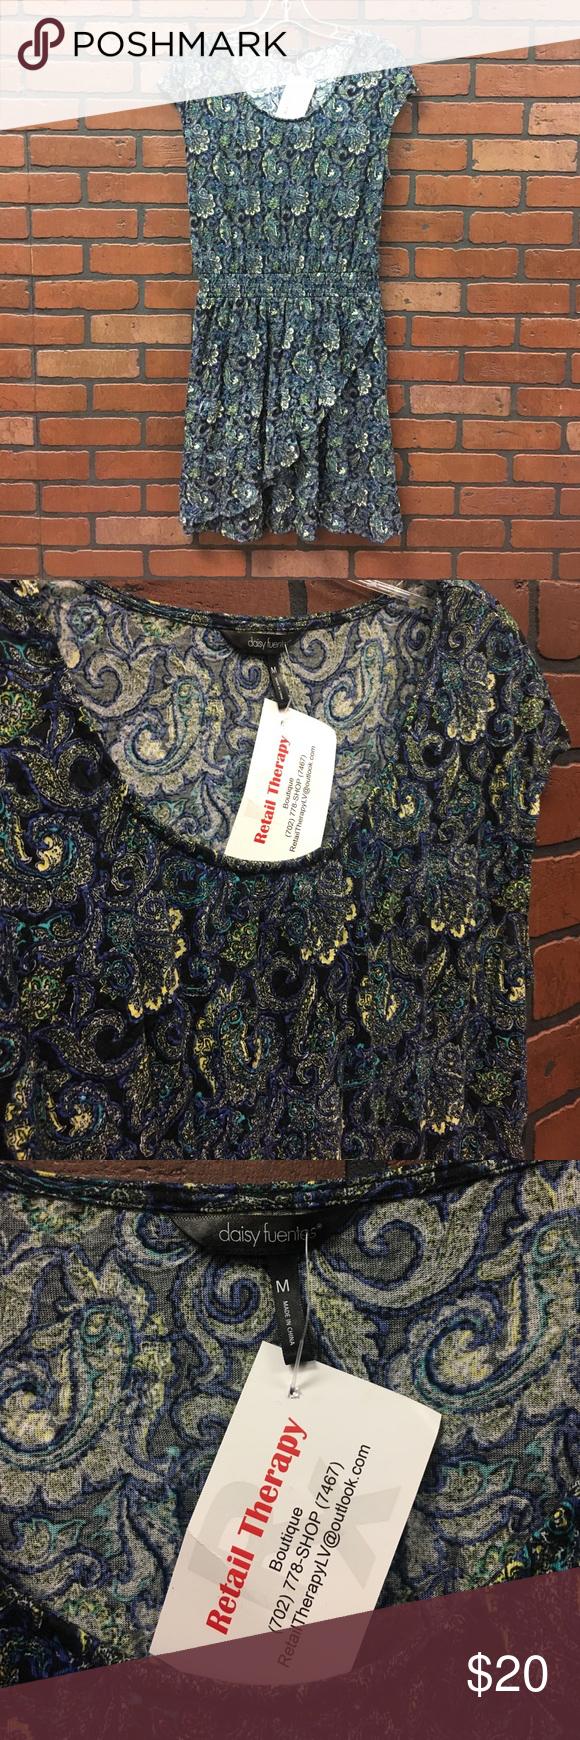 Daisy Fuentes Floral Dress Great condition! Elastic waist 😀 Daisy Fuentes Dresses Midi